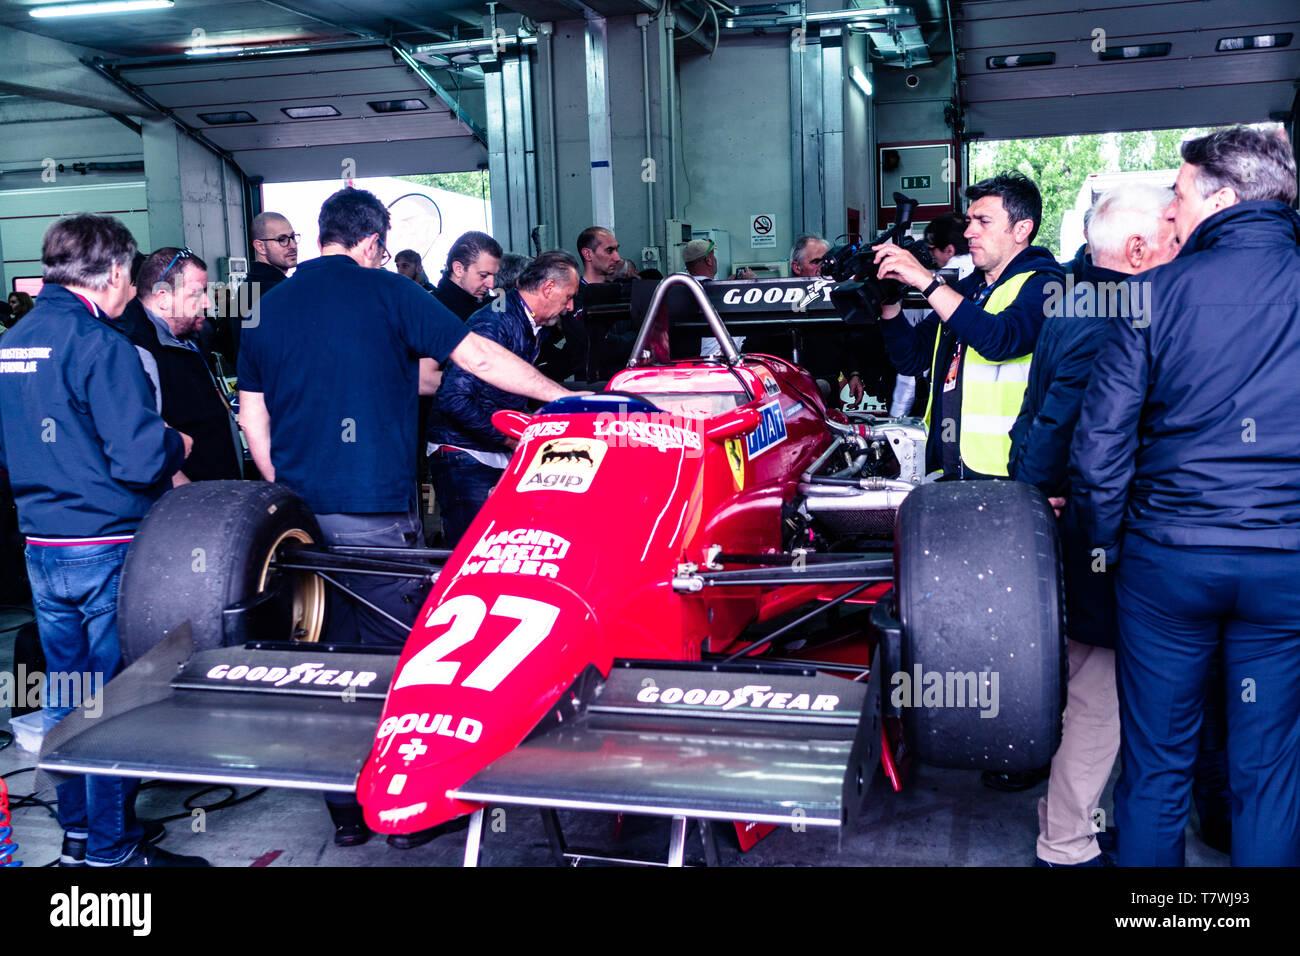 Vintage Ferrari is surrounding by fans Stock Photo